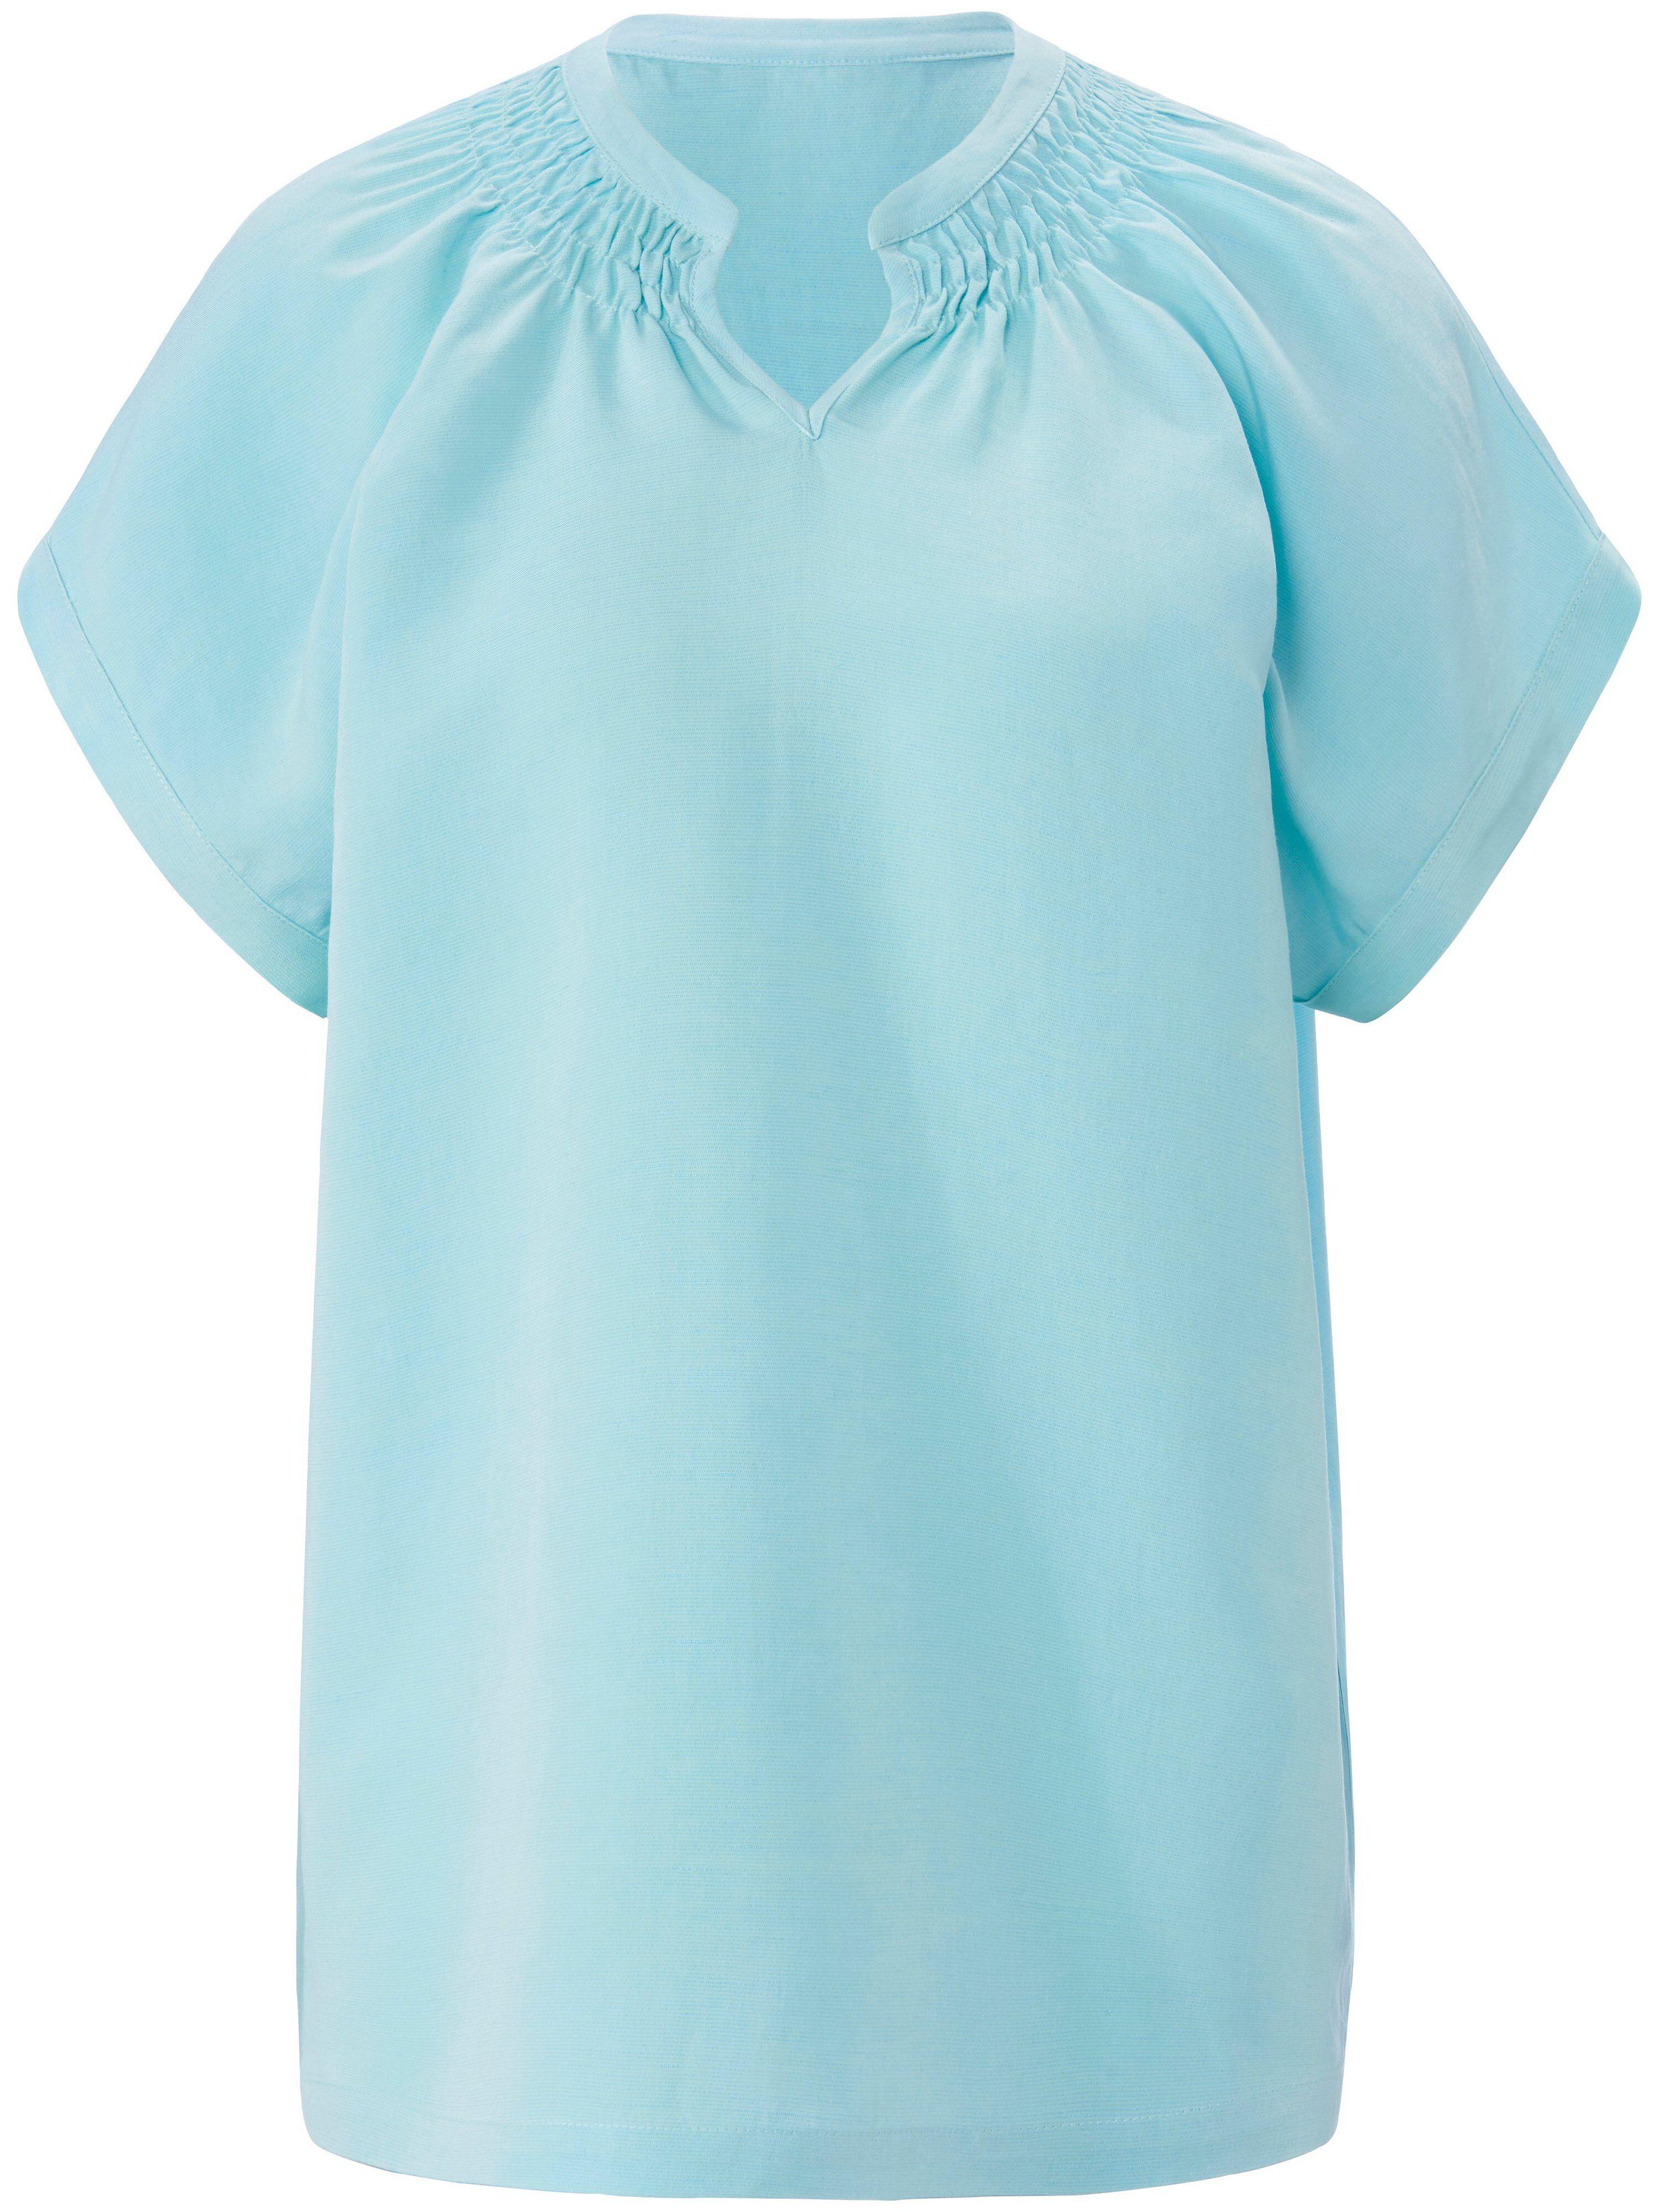 MYBC La blouse ligne à enfiler  MYBC bleu  - Femme - 38